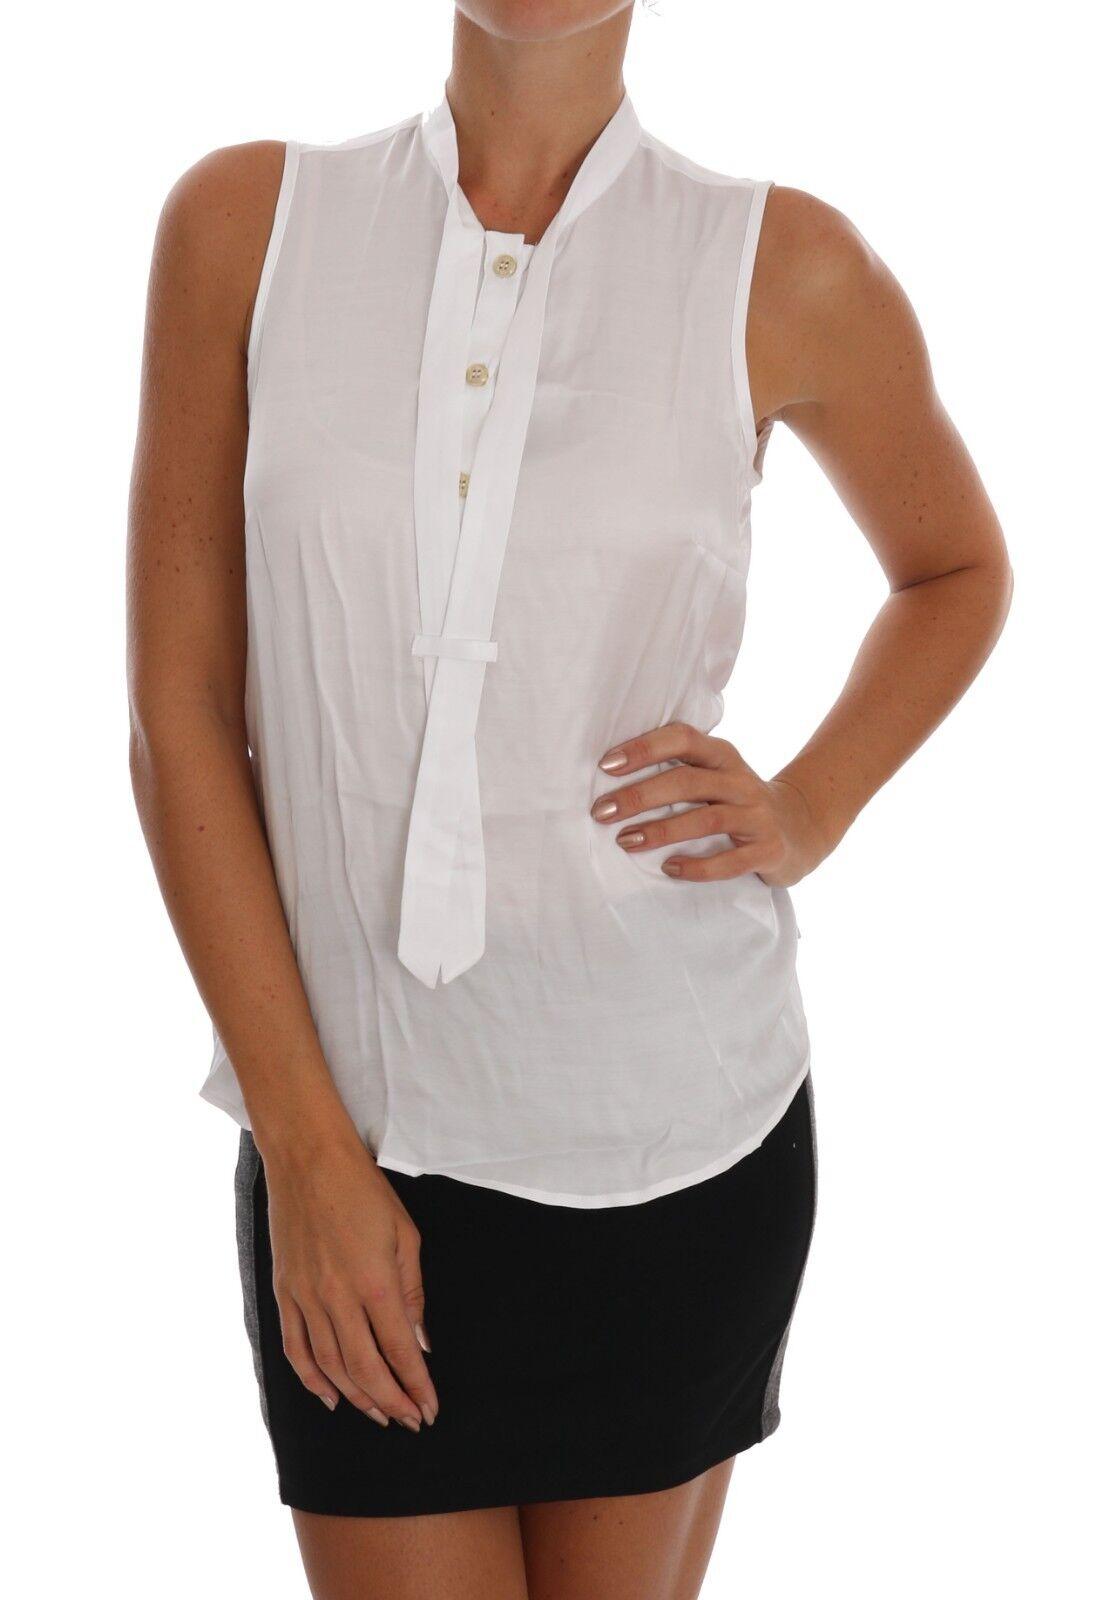 NEW  VERSACE JEANS VJ Shirt Blouse Top Weiß Sleeveless Viscose IT40  US4  S